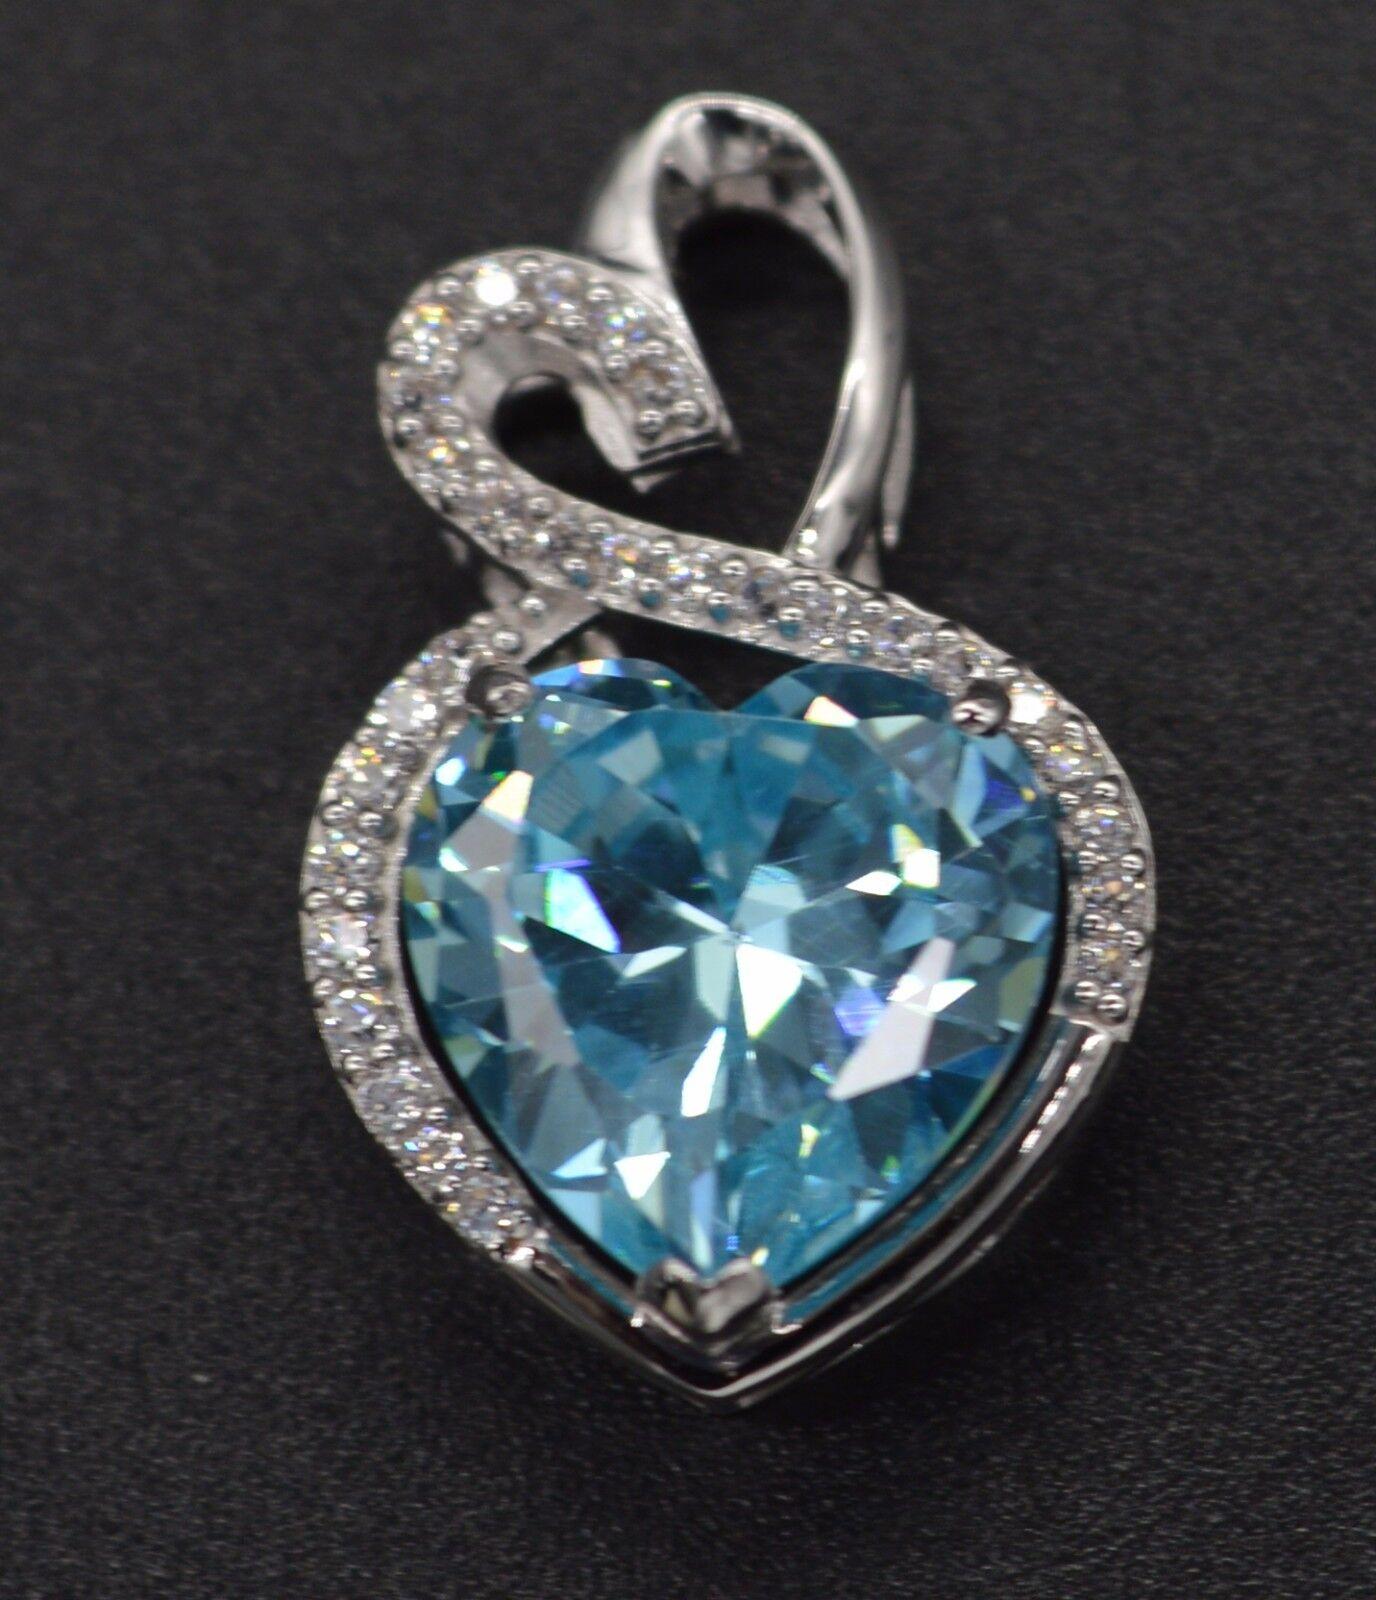 PM22 3.00ct Created Diamond bluee Heart Cut Pendant 14k Soild White gold